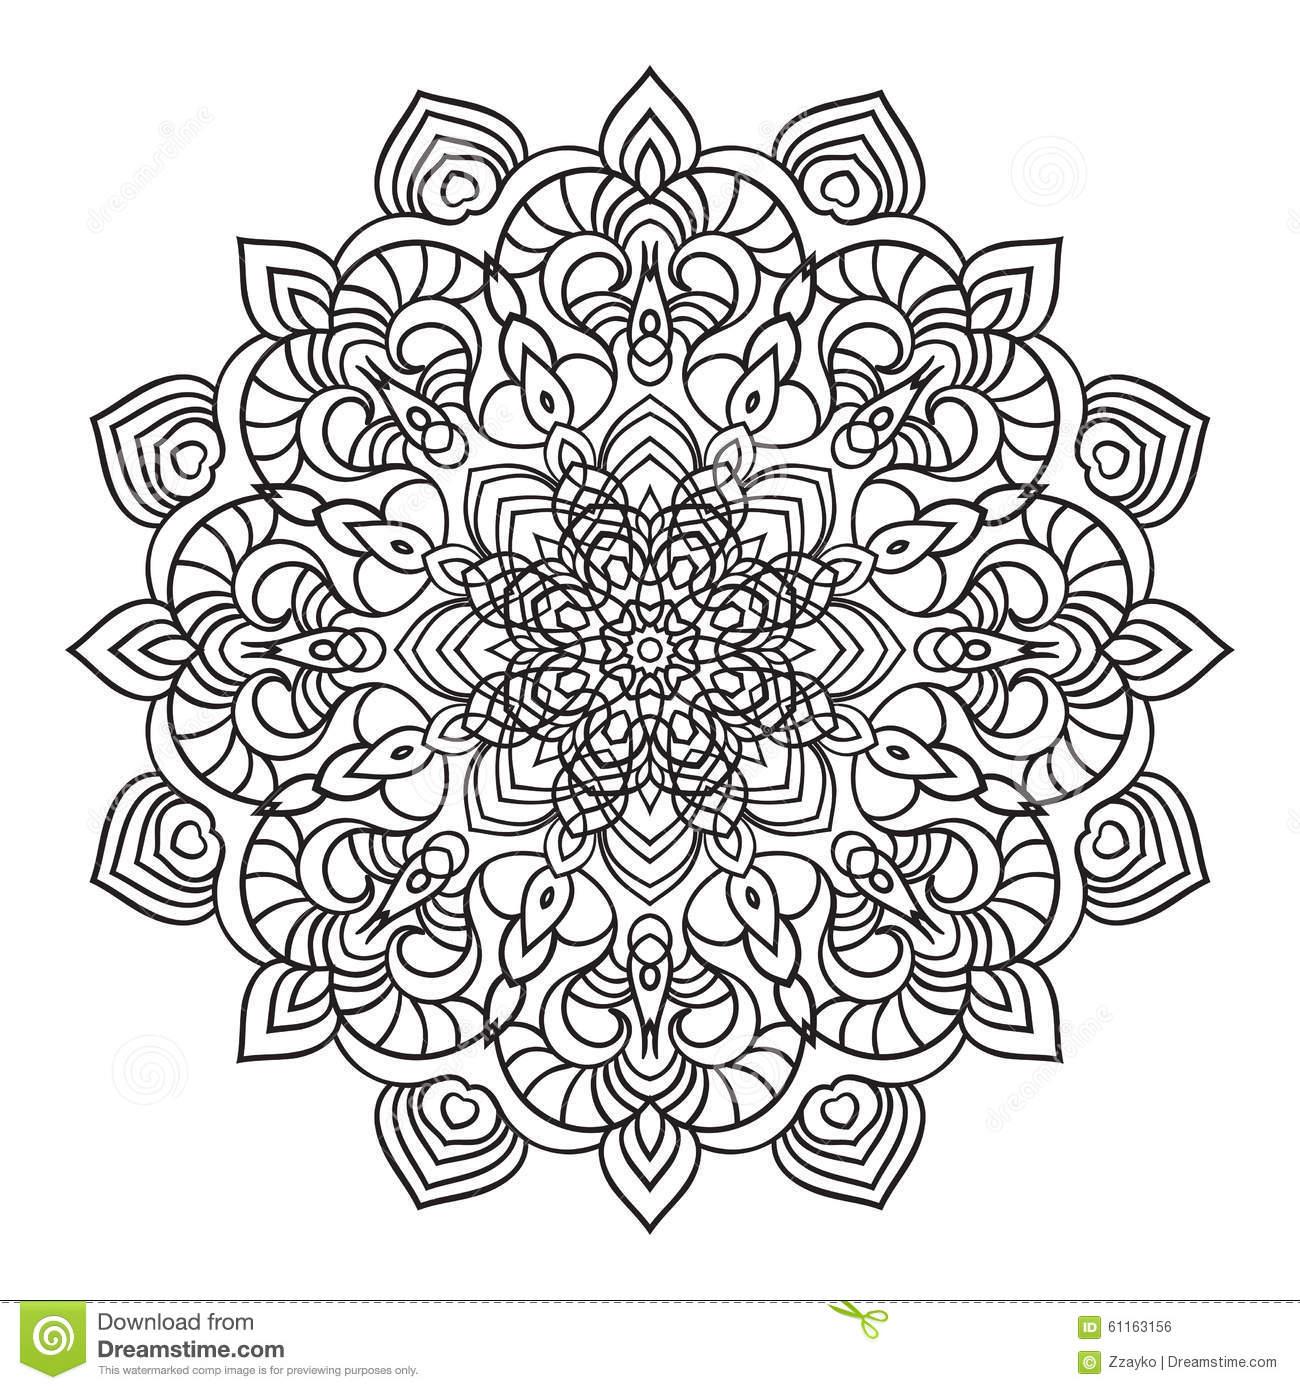 Hd Wallpapers Coloriage Mandala Rosace Imprimer Wallpaper avec Rosace A Imprimer